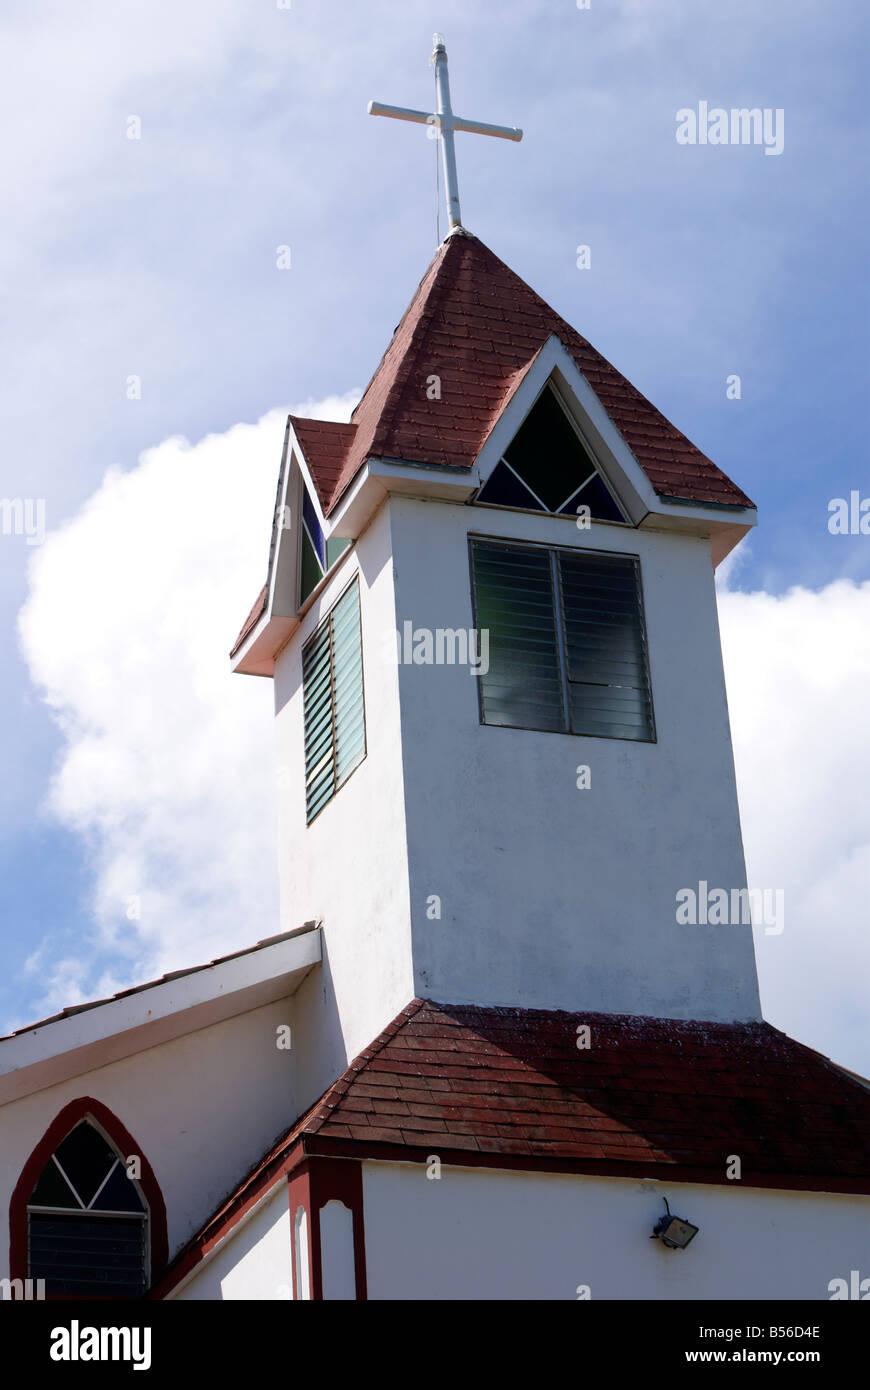 Ebeneezer Baptist Church on Big Corn Island, Nicaragua, Central America Stock Photo